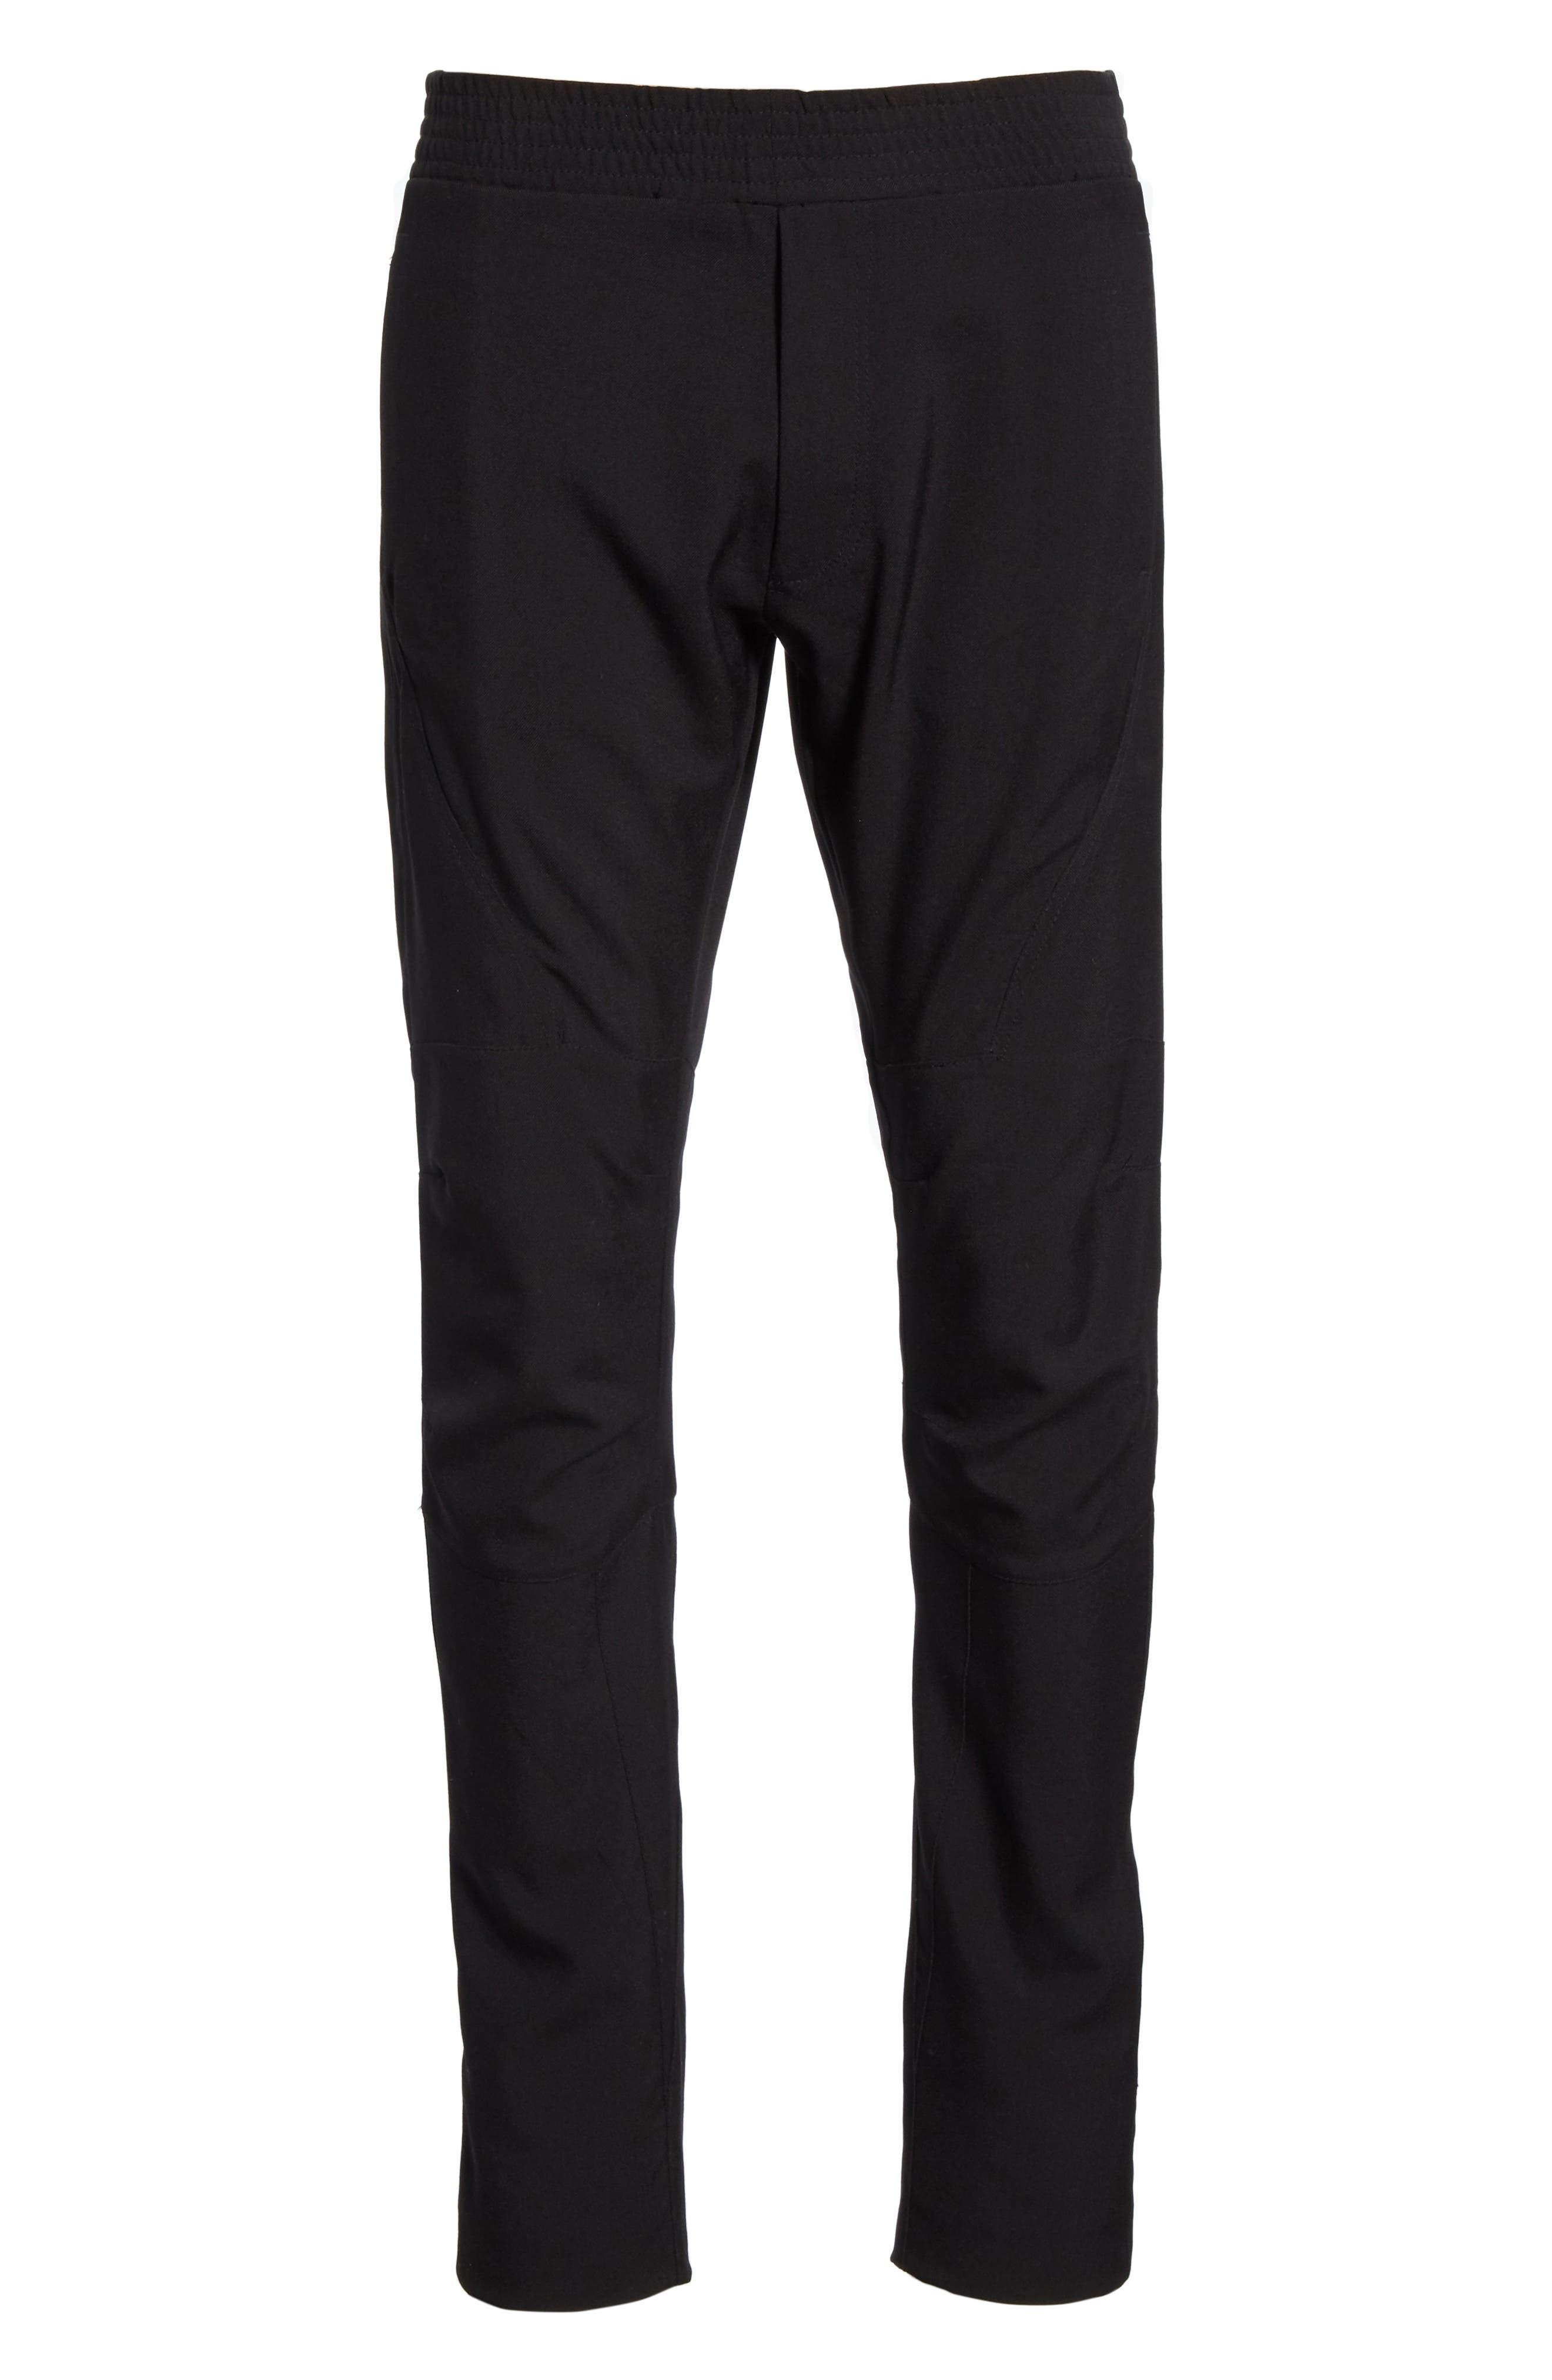 Wool & Mohair Biker Pants,                             Alternate thumbnail 6, color,                             BLACK